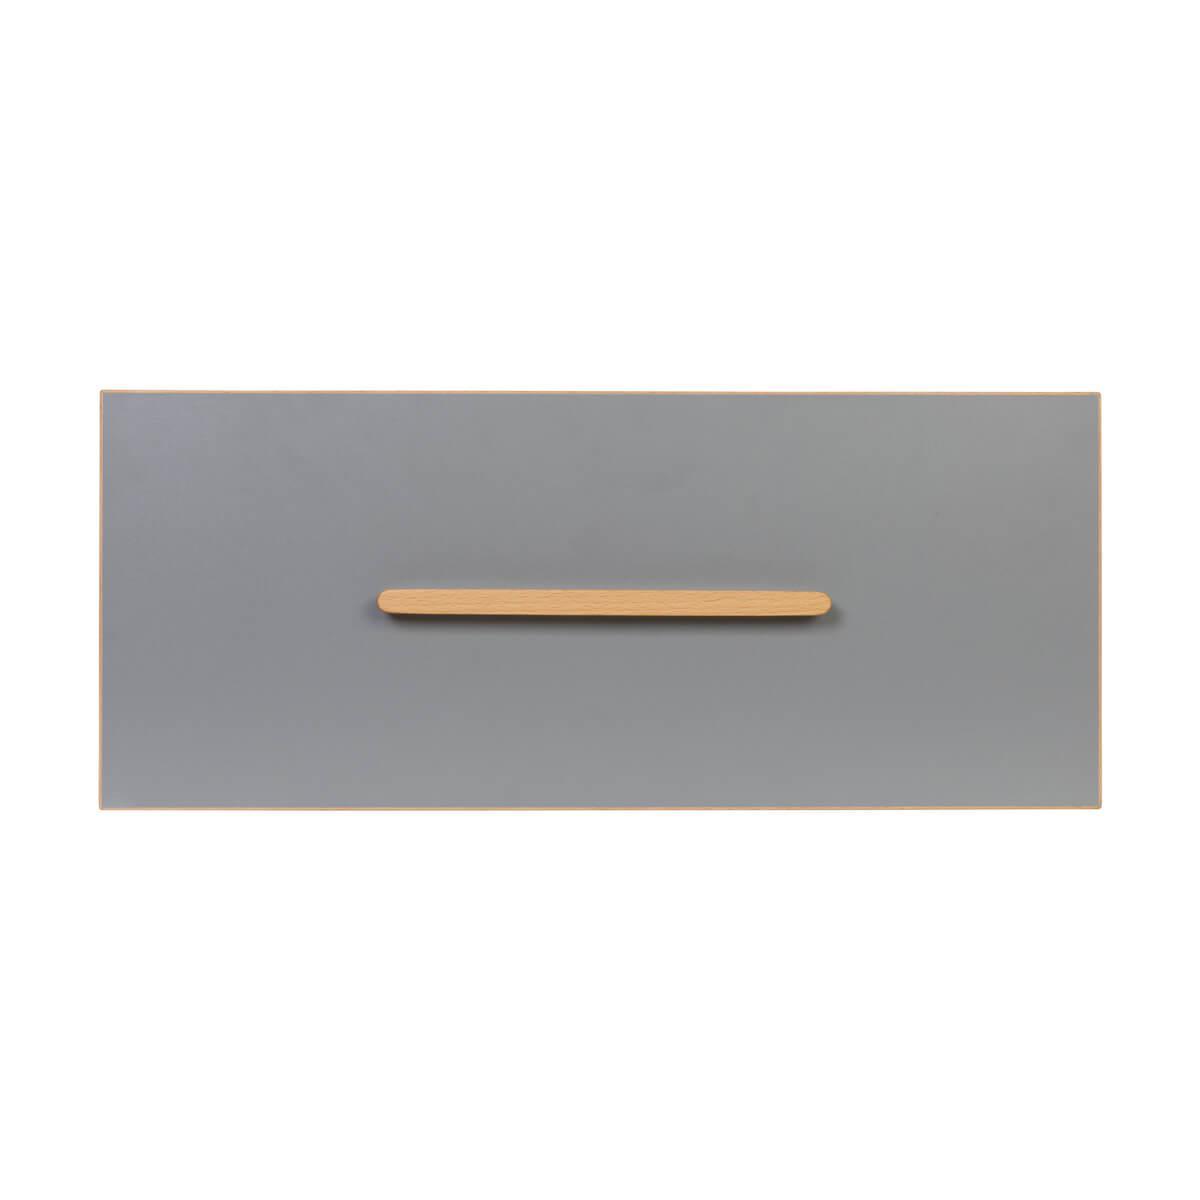 Frontschublade NADO slate grey